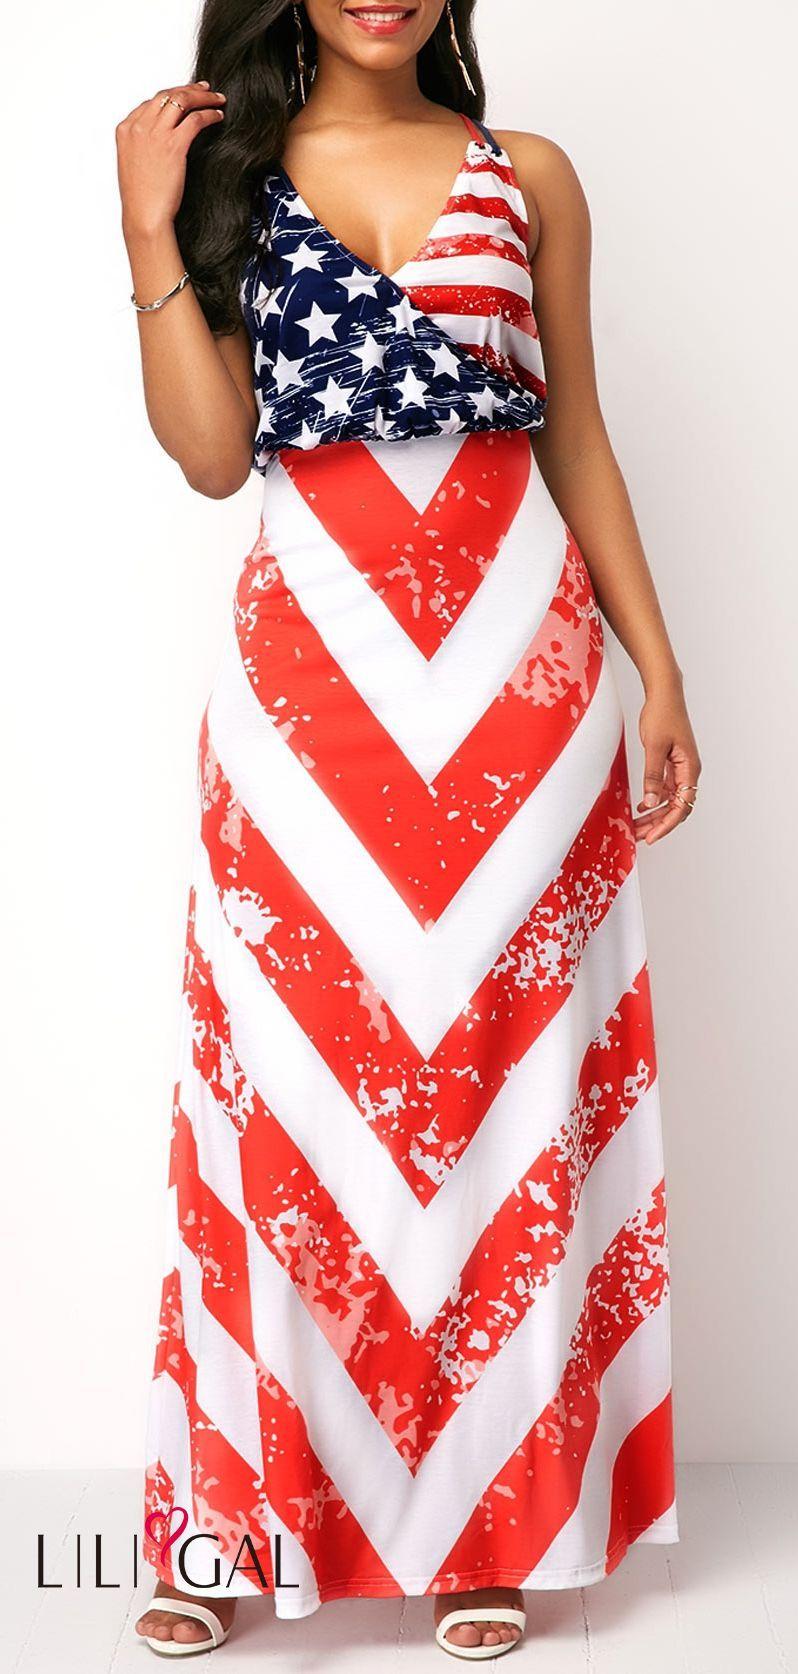 f939af36b1 V Neck Star Print Sleeveless Maxi Dress  liligal  4thofjuly  fourthofjuly   patriotic